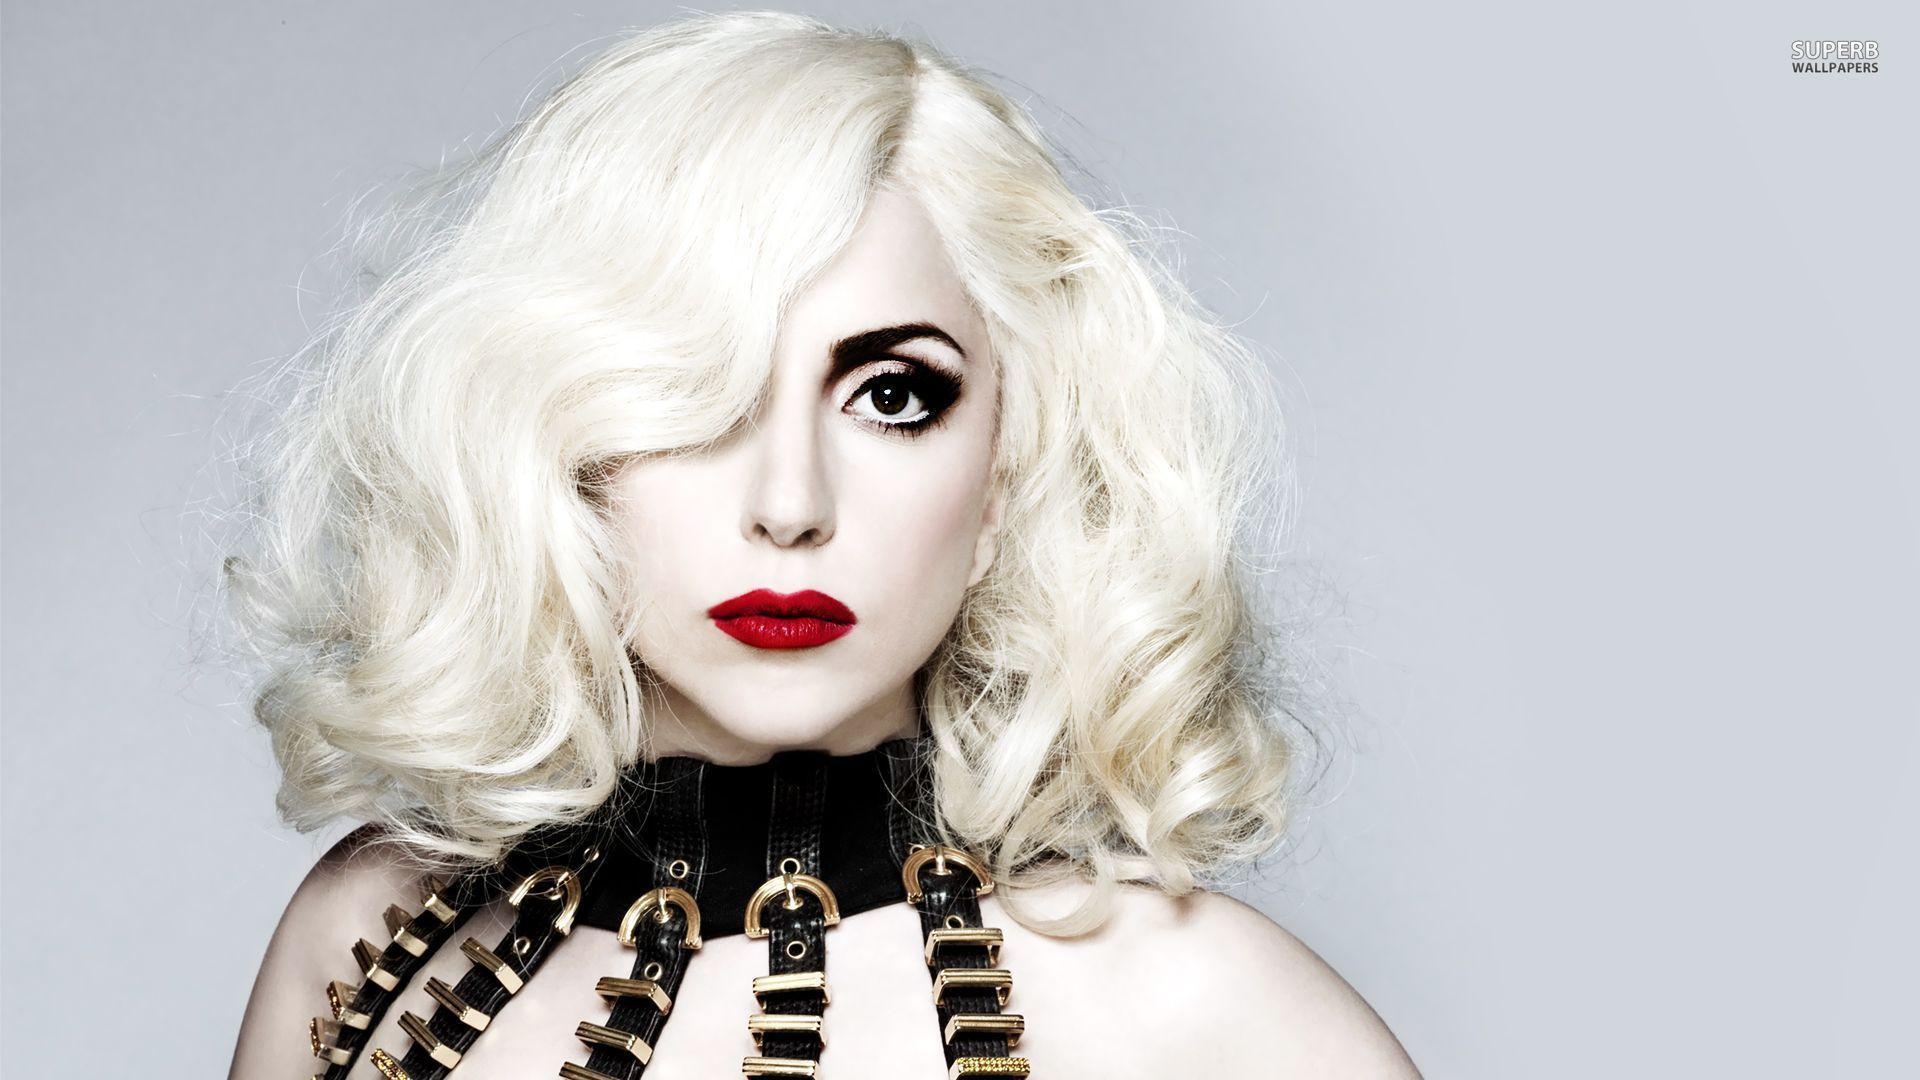 Lady Gaga Wallpapers 2015 - Wallpaper Cave